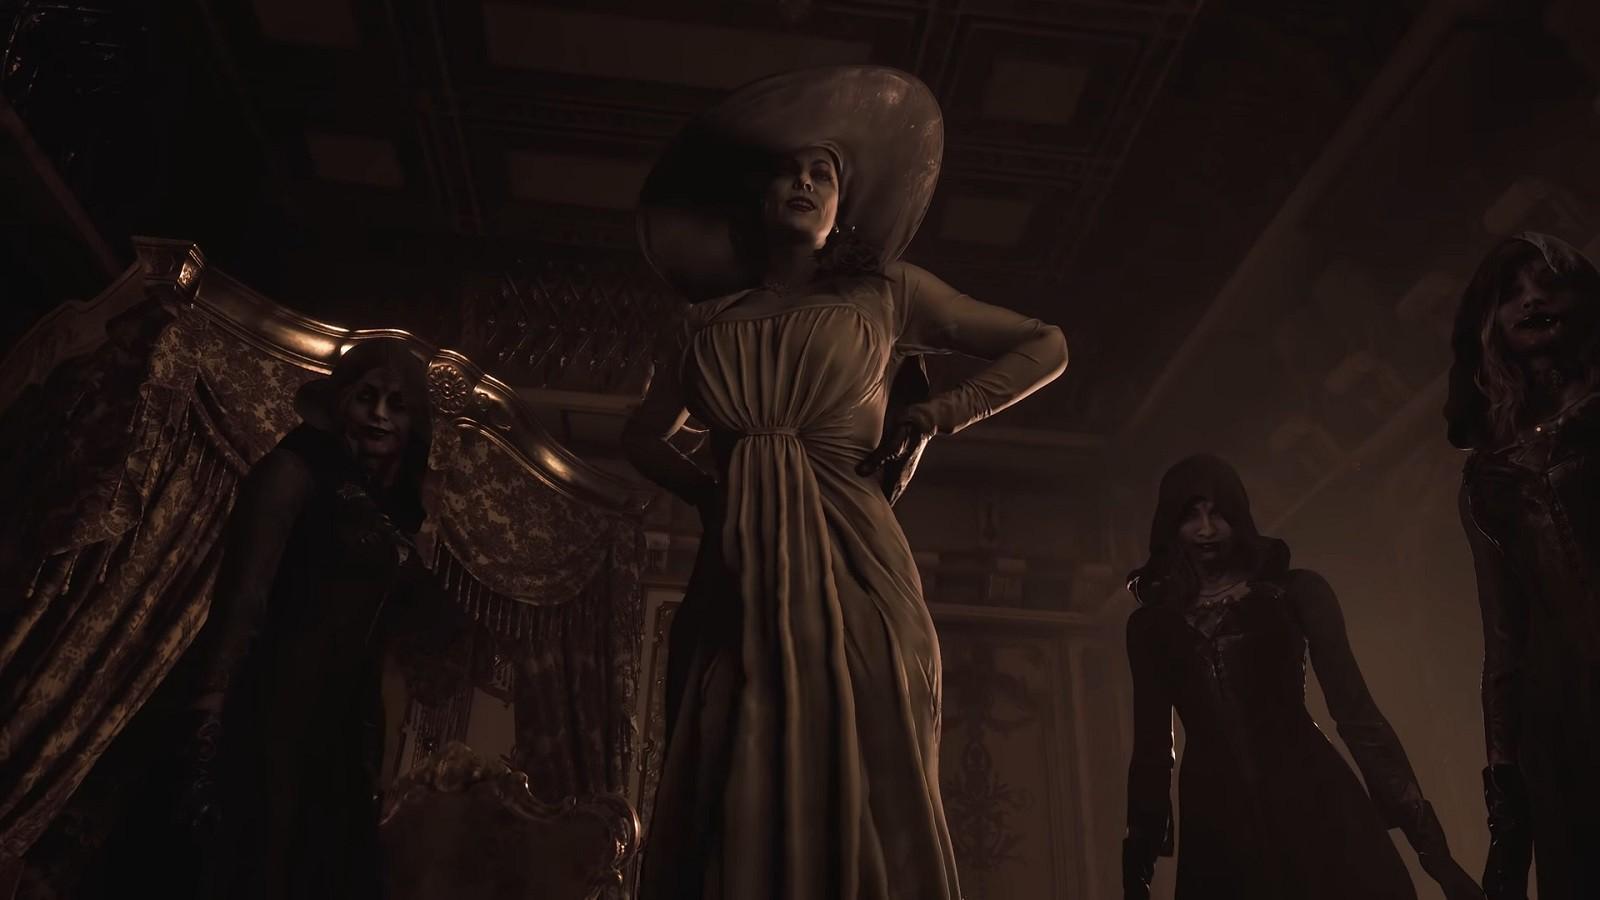 Новый трейлер и геймплей Resident Evil Village покажут 22 января 2